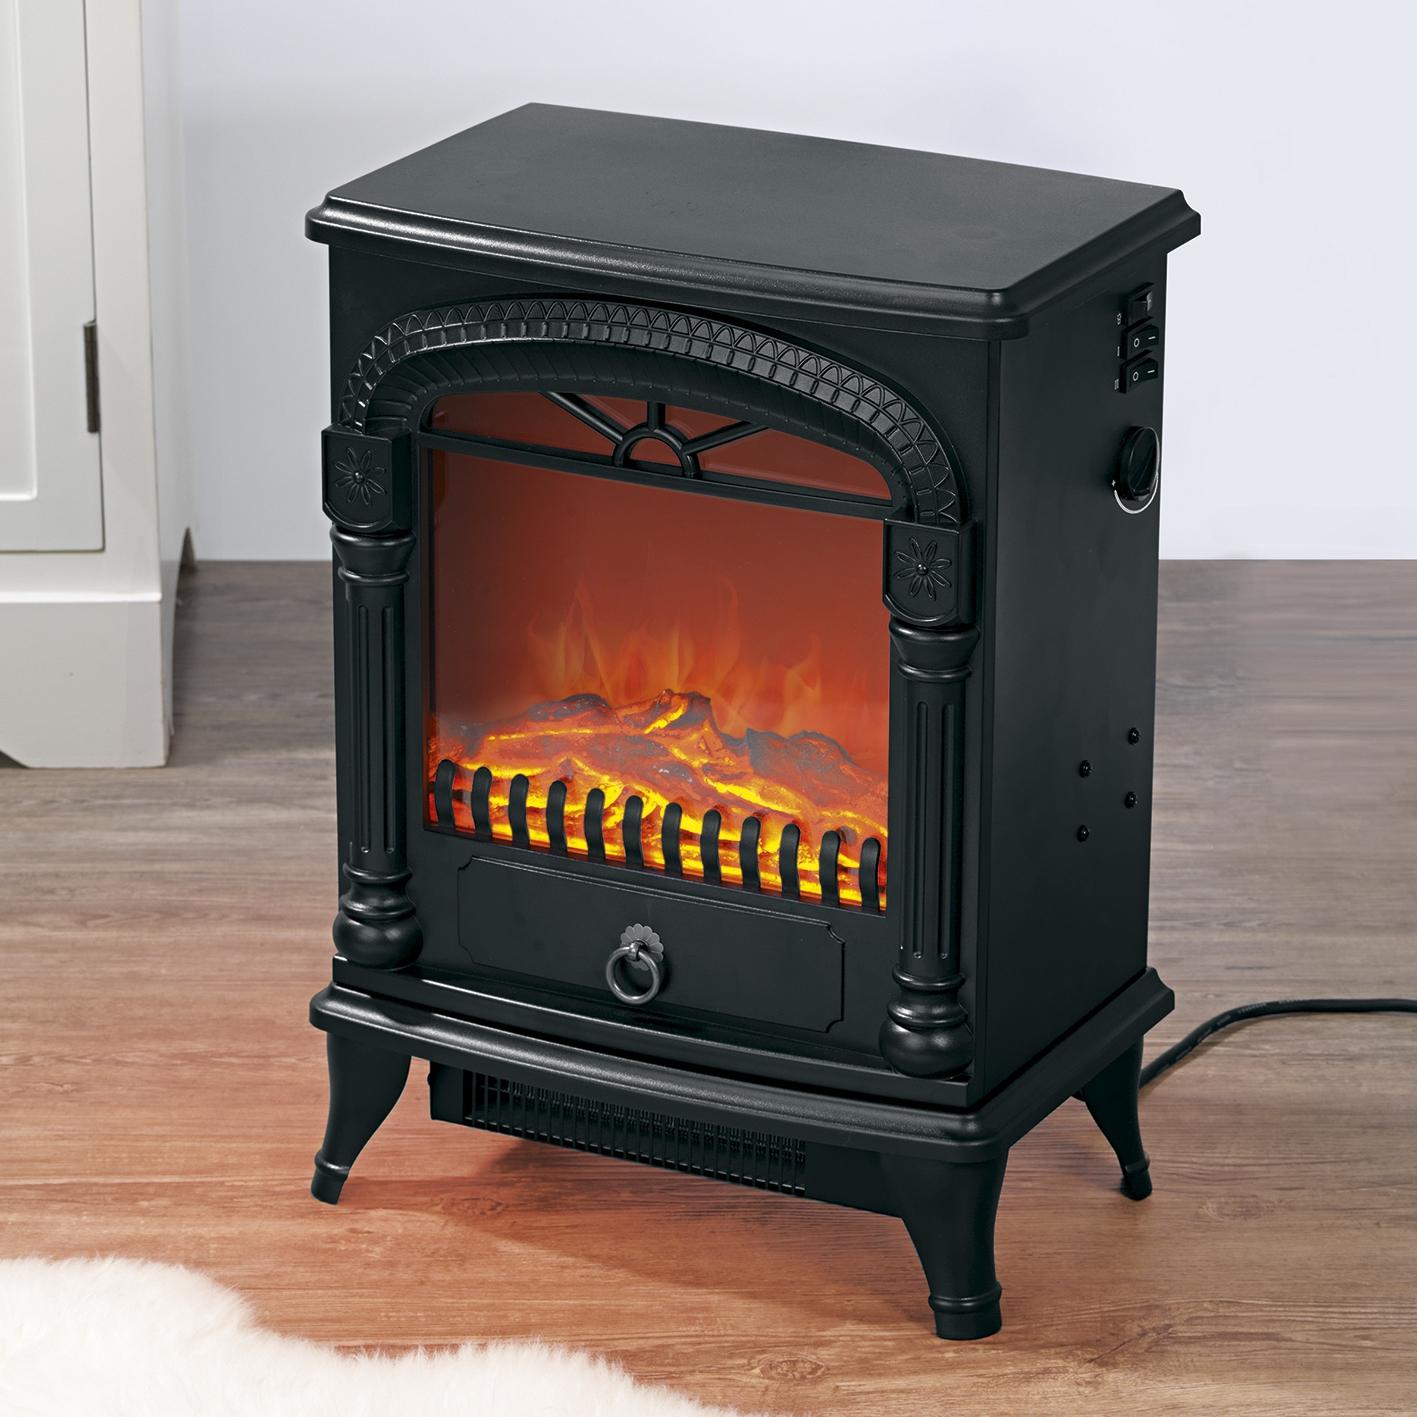 easymaxx elektro led stand kamin nostalgie flammeneffekt heizung schwarz 1950w ebay. Black Bedroom Furniture Sets. Home Design Ideas